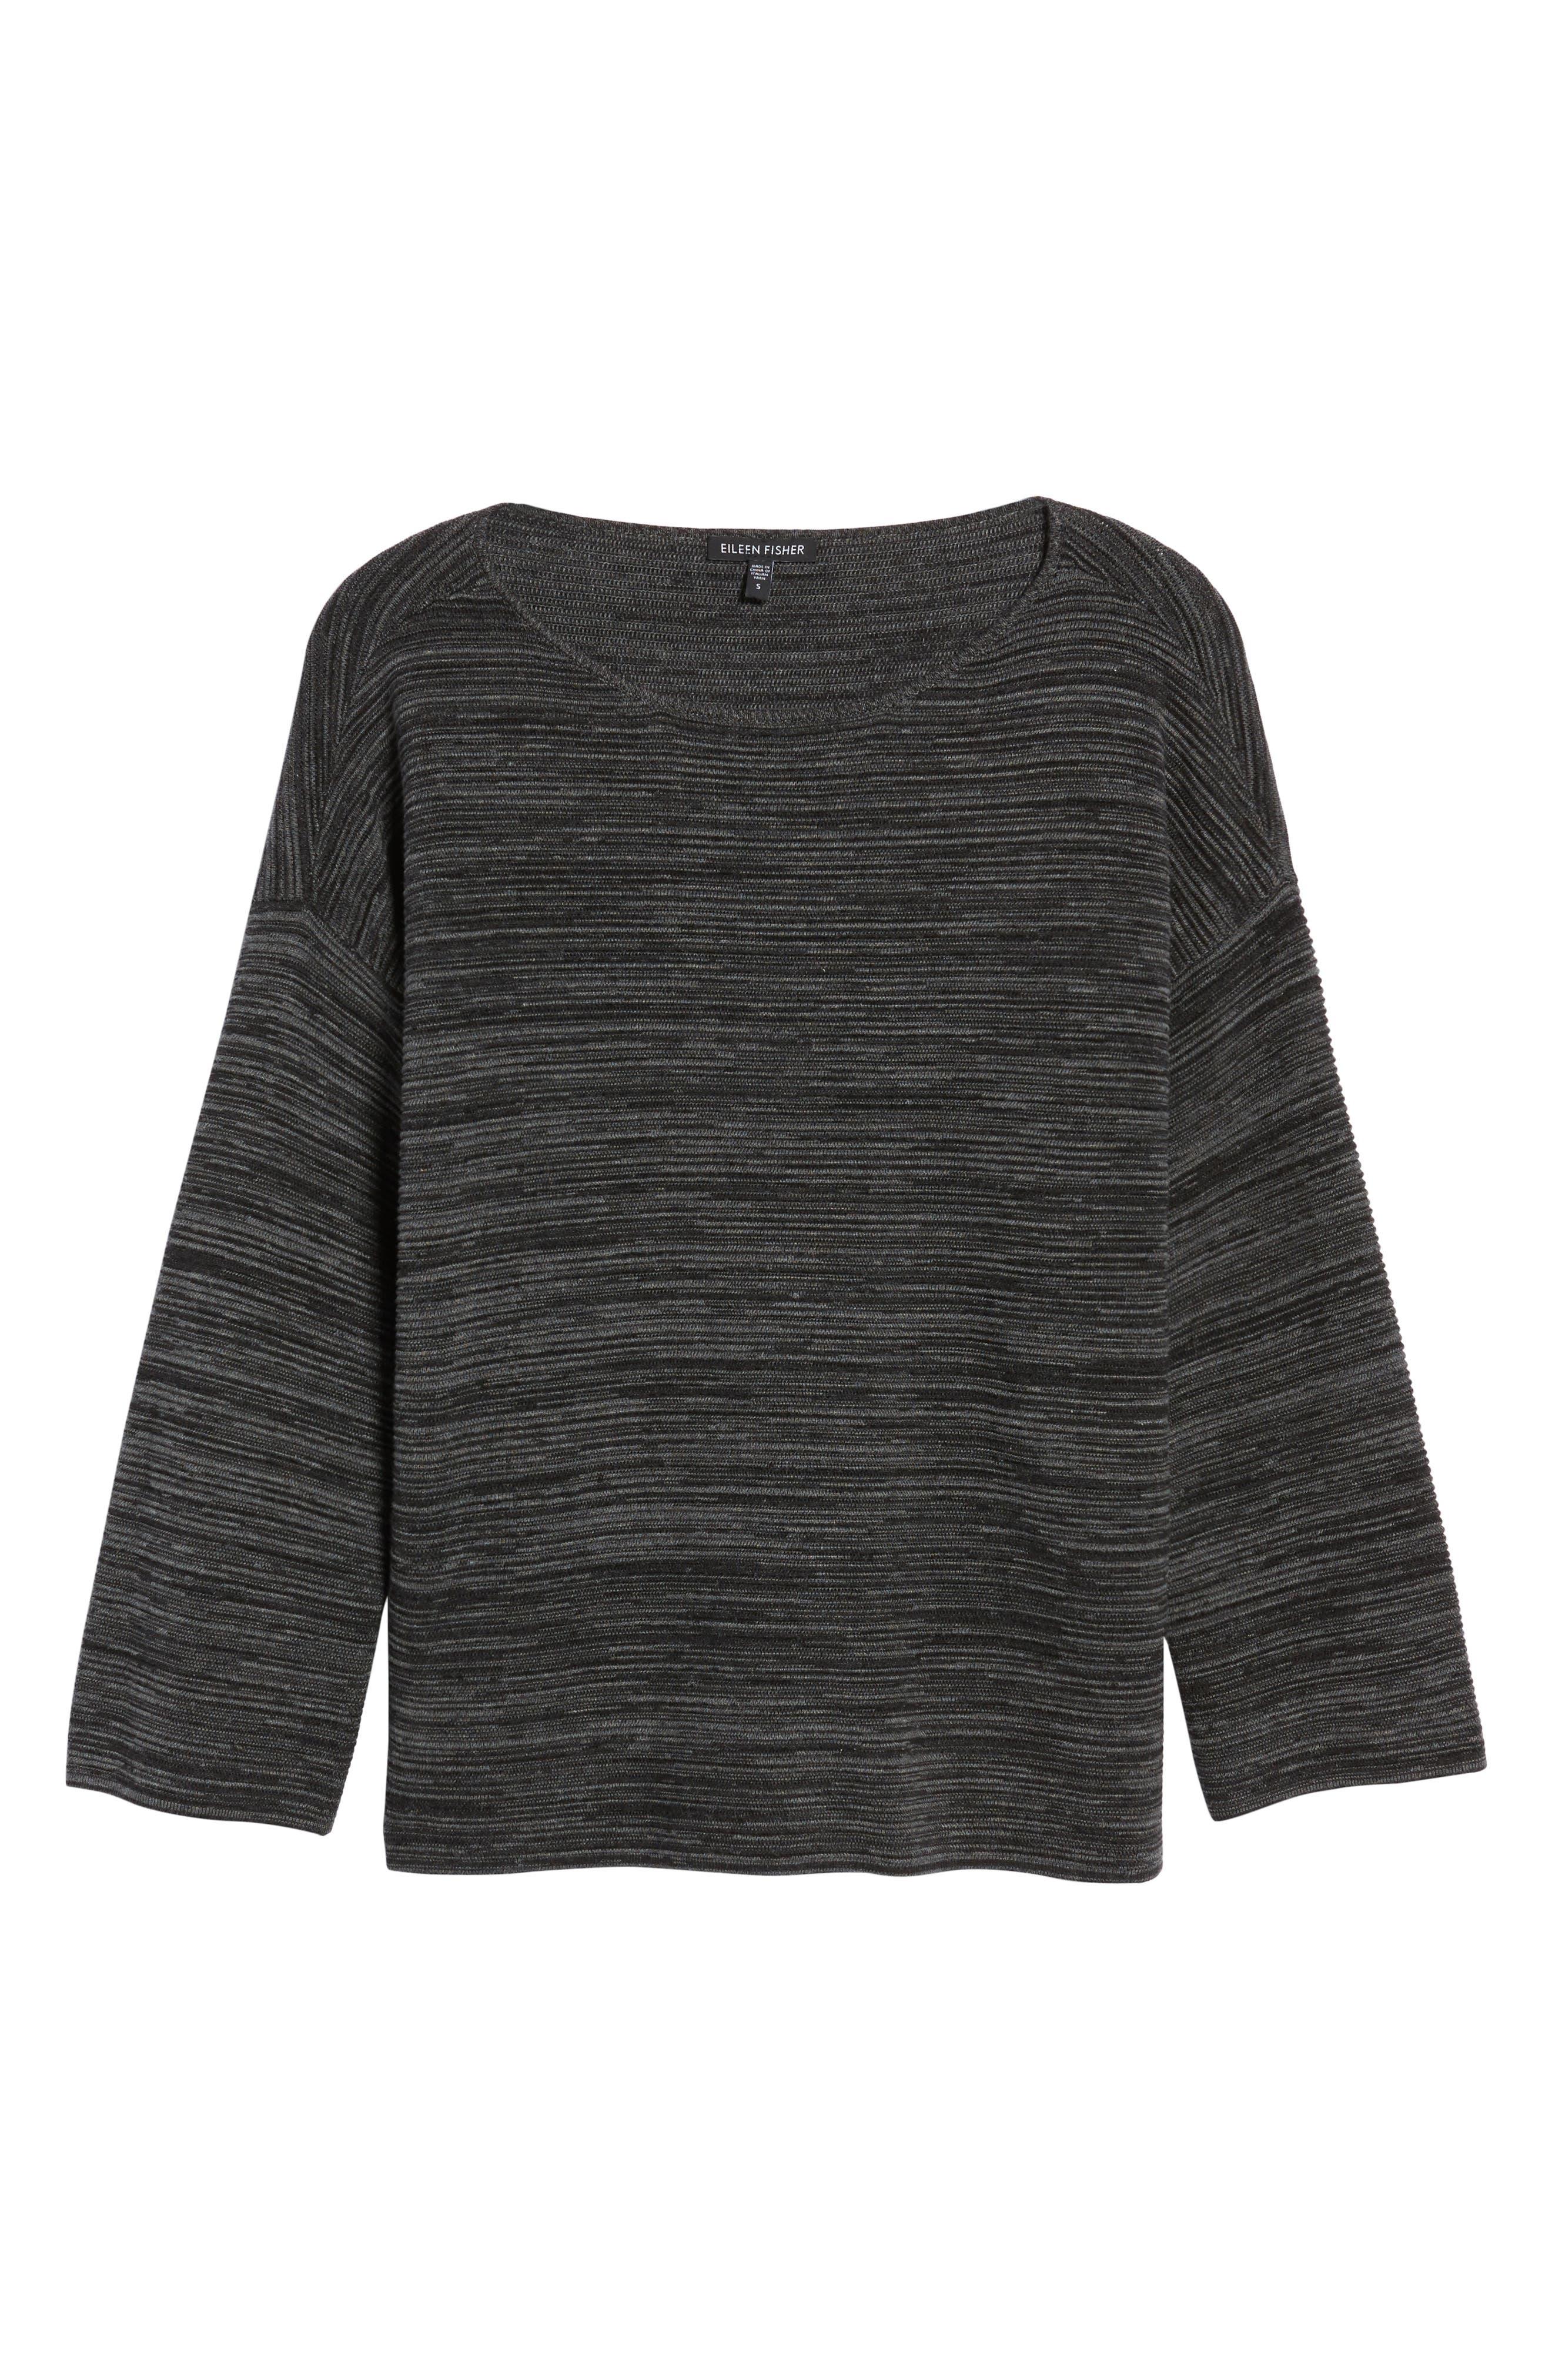 Tencel<sup>®</sup> & Organic Cotton Sweater,                             Alternate thumbnail 6, color,                             001